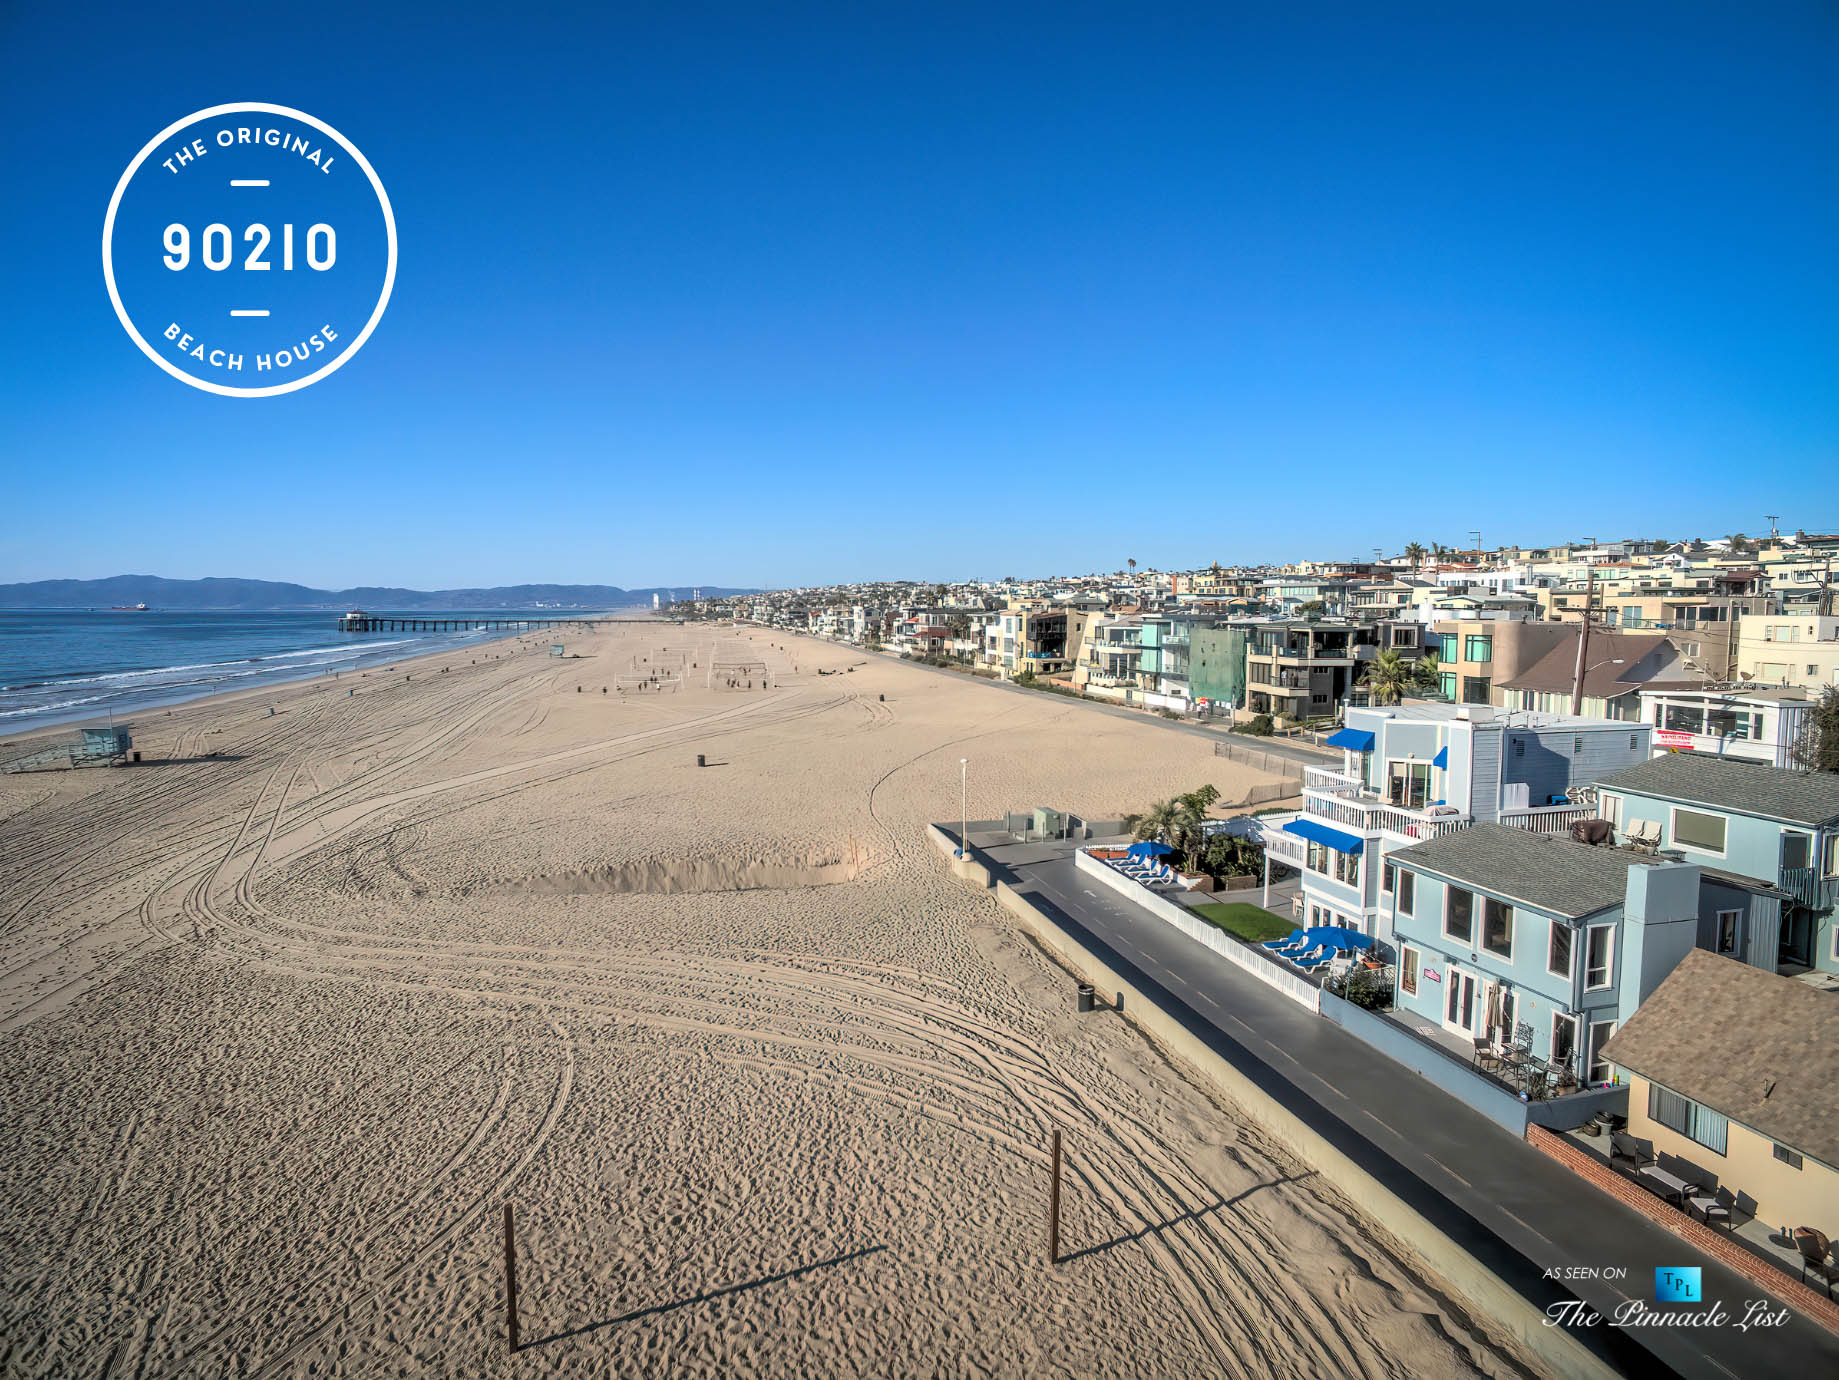 The Original 90210 Beach House - 3500 The Strand, Hermosa Beach, CA, USA - Beachfront Location Aerial View